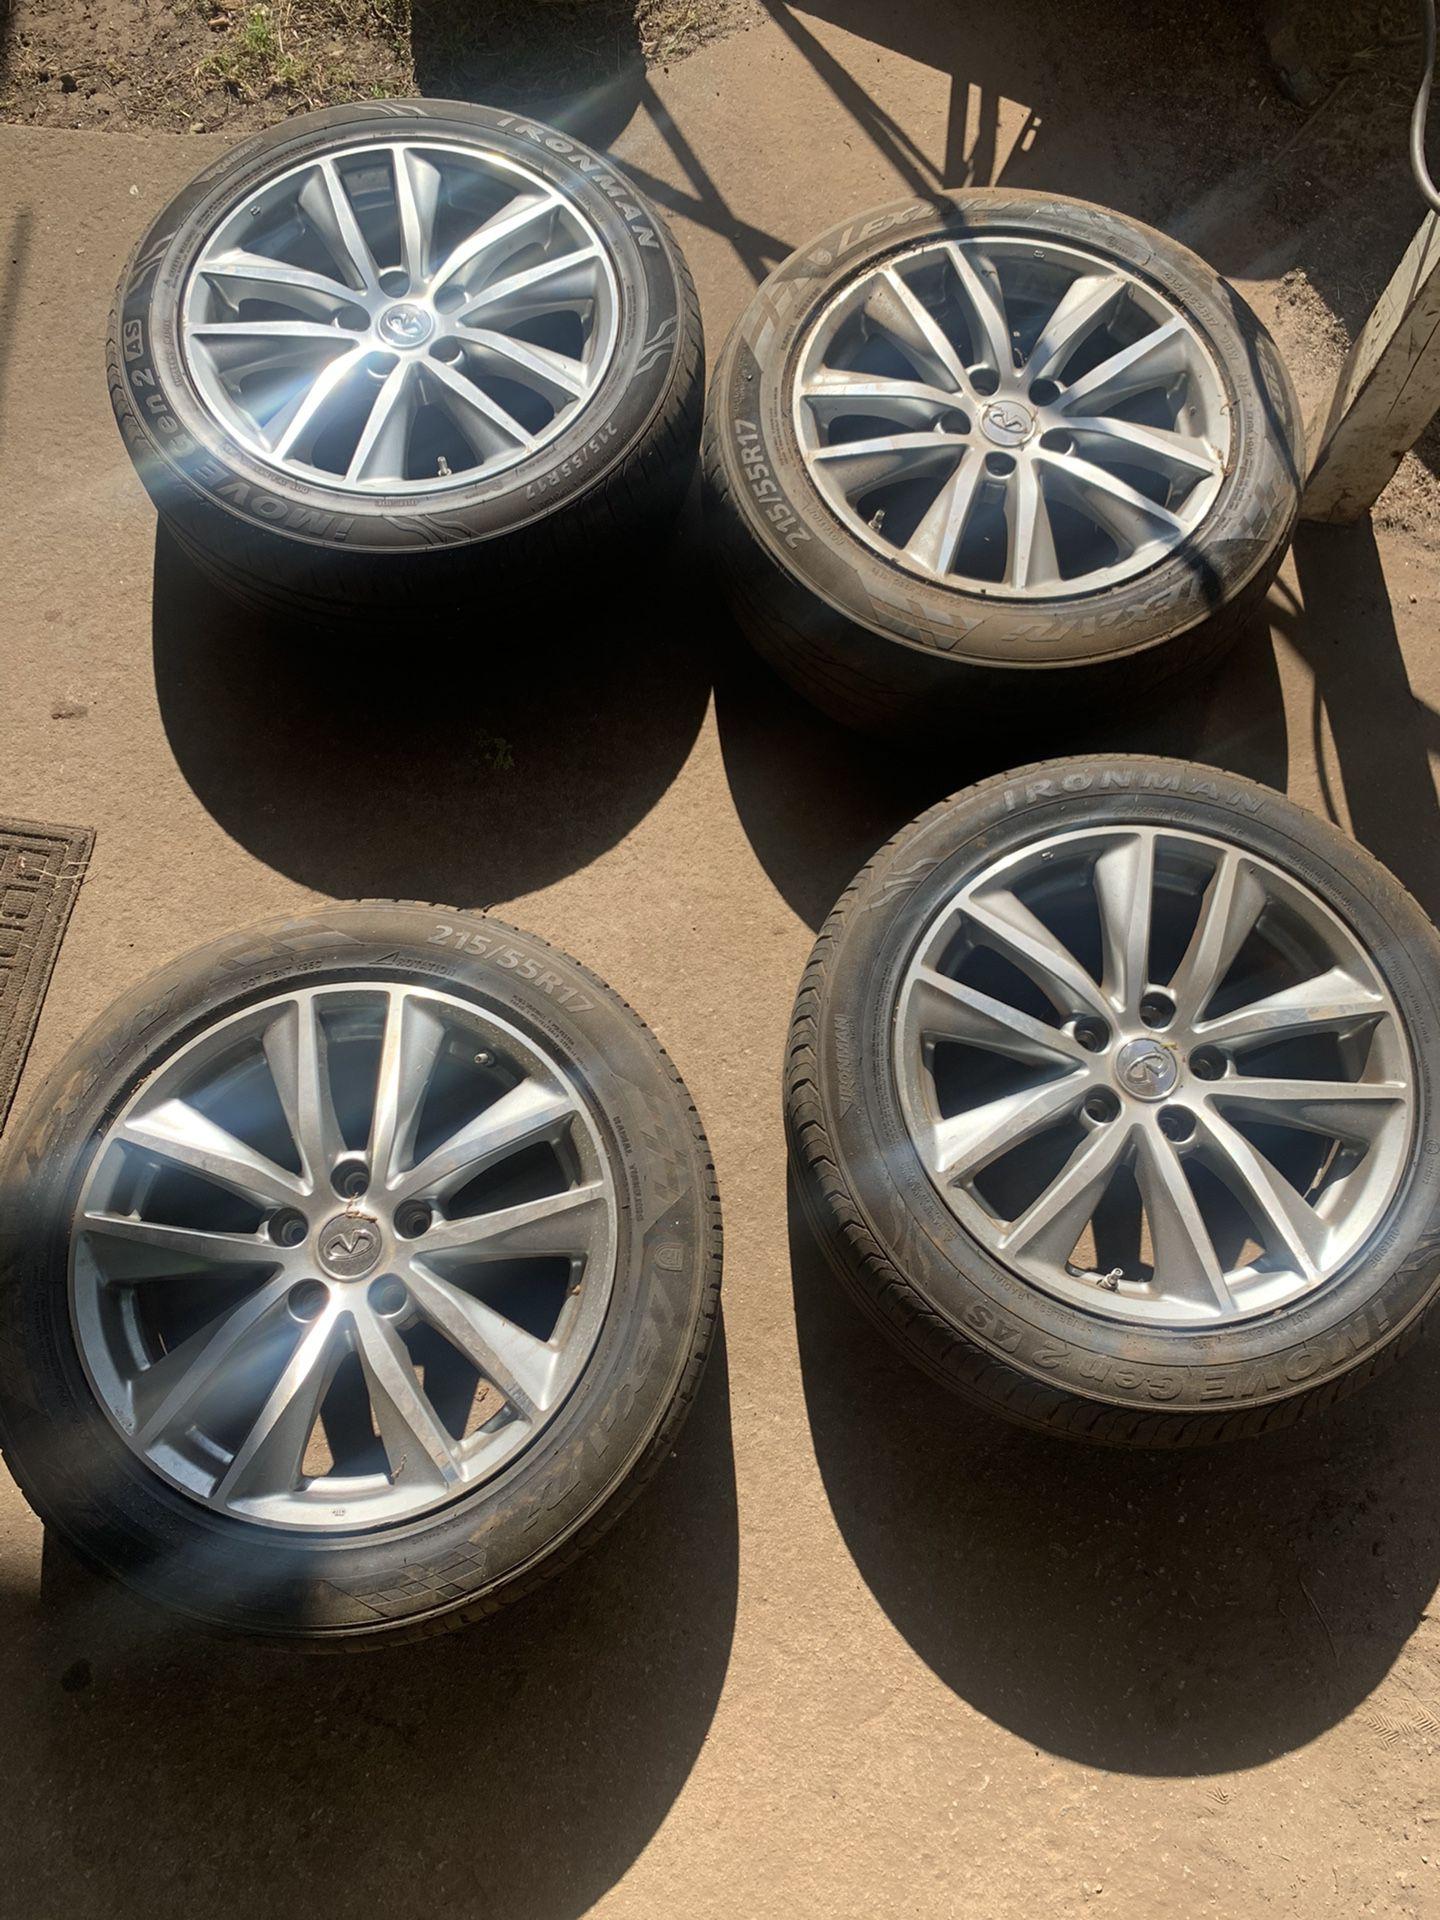 Infiniti Rims 17inch/ Brand New Tires